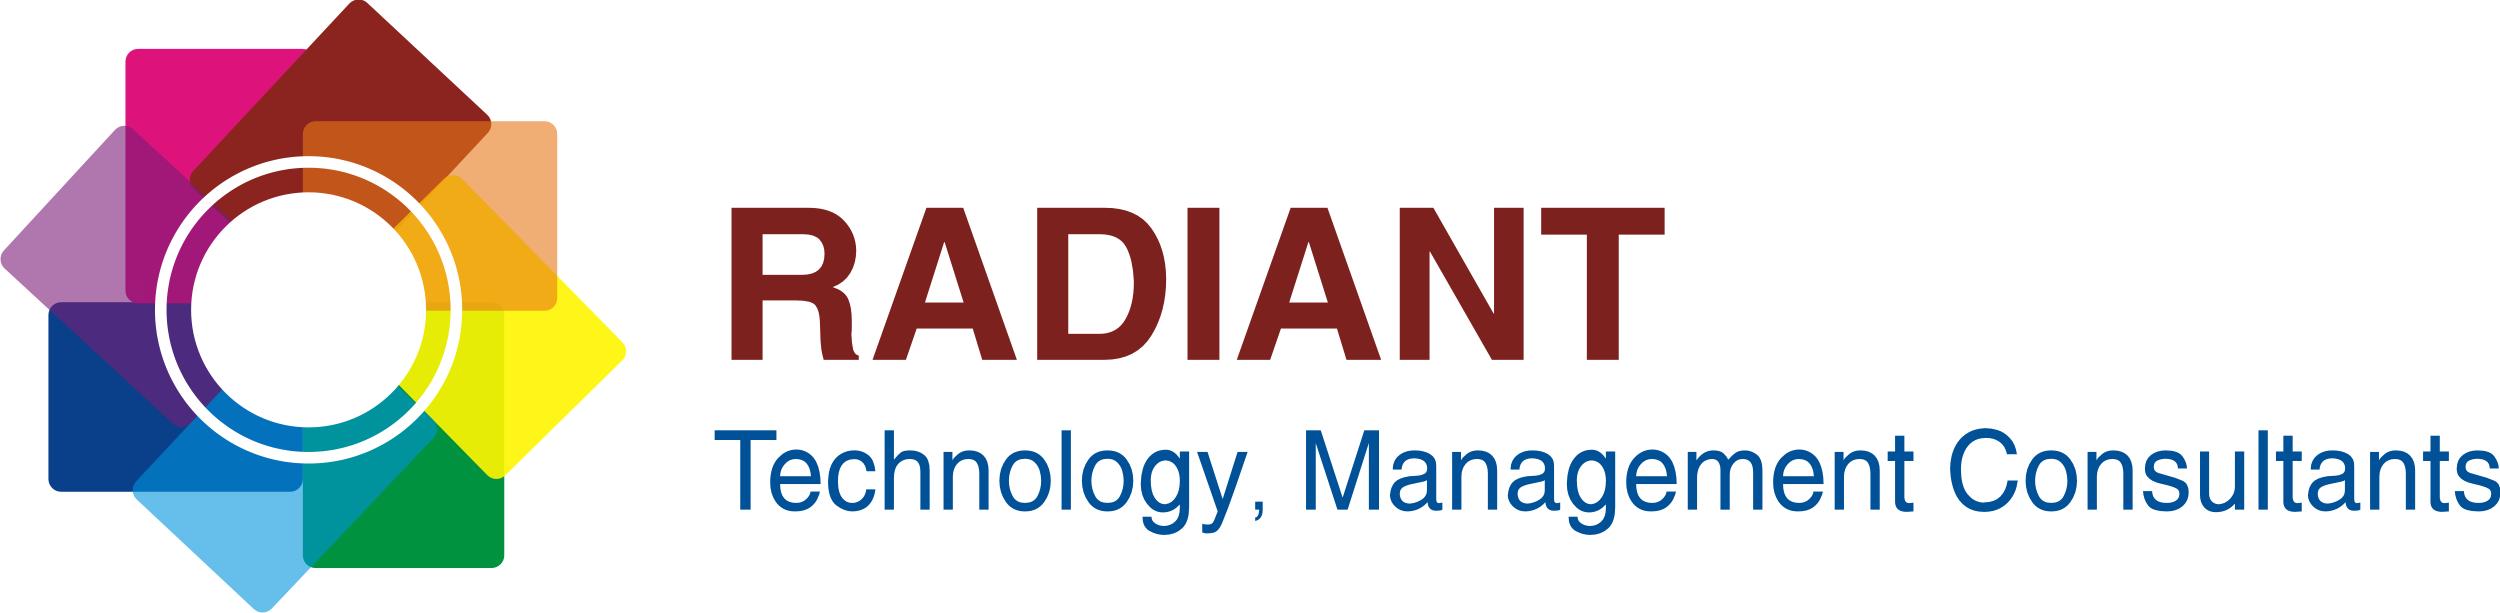 Radiant-intl-consultants